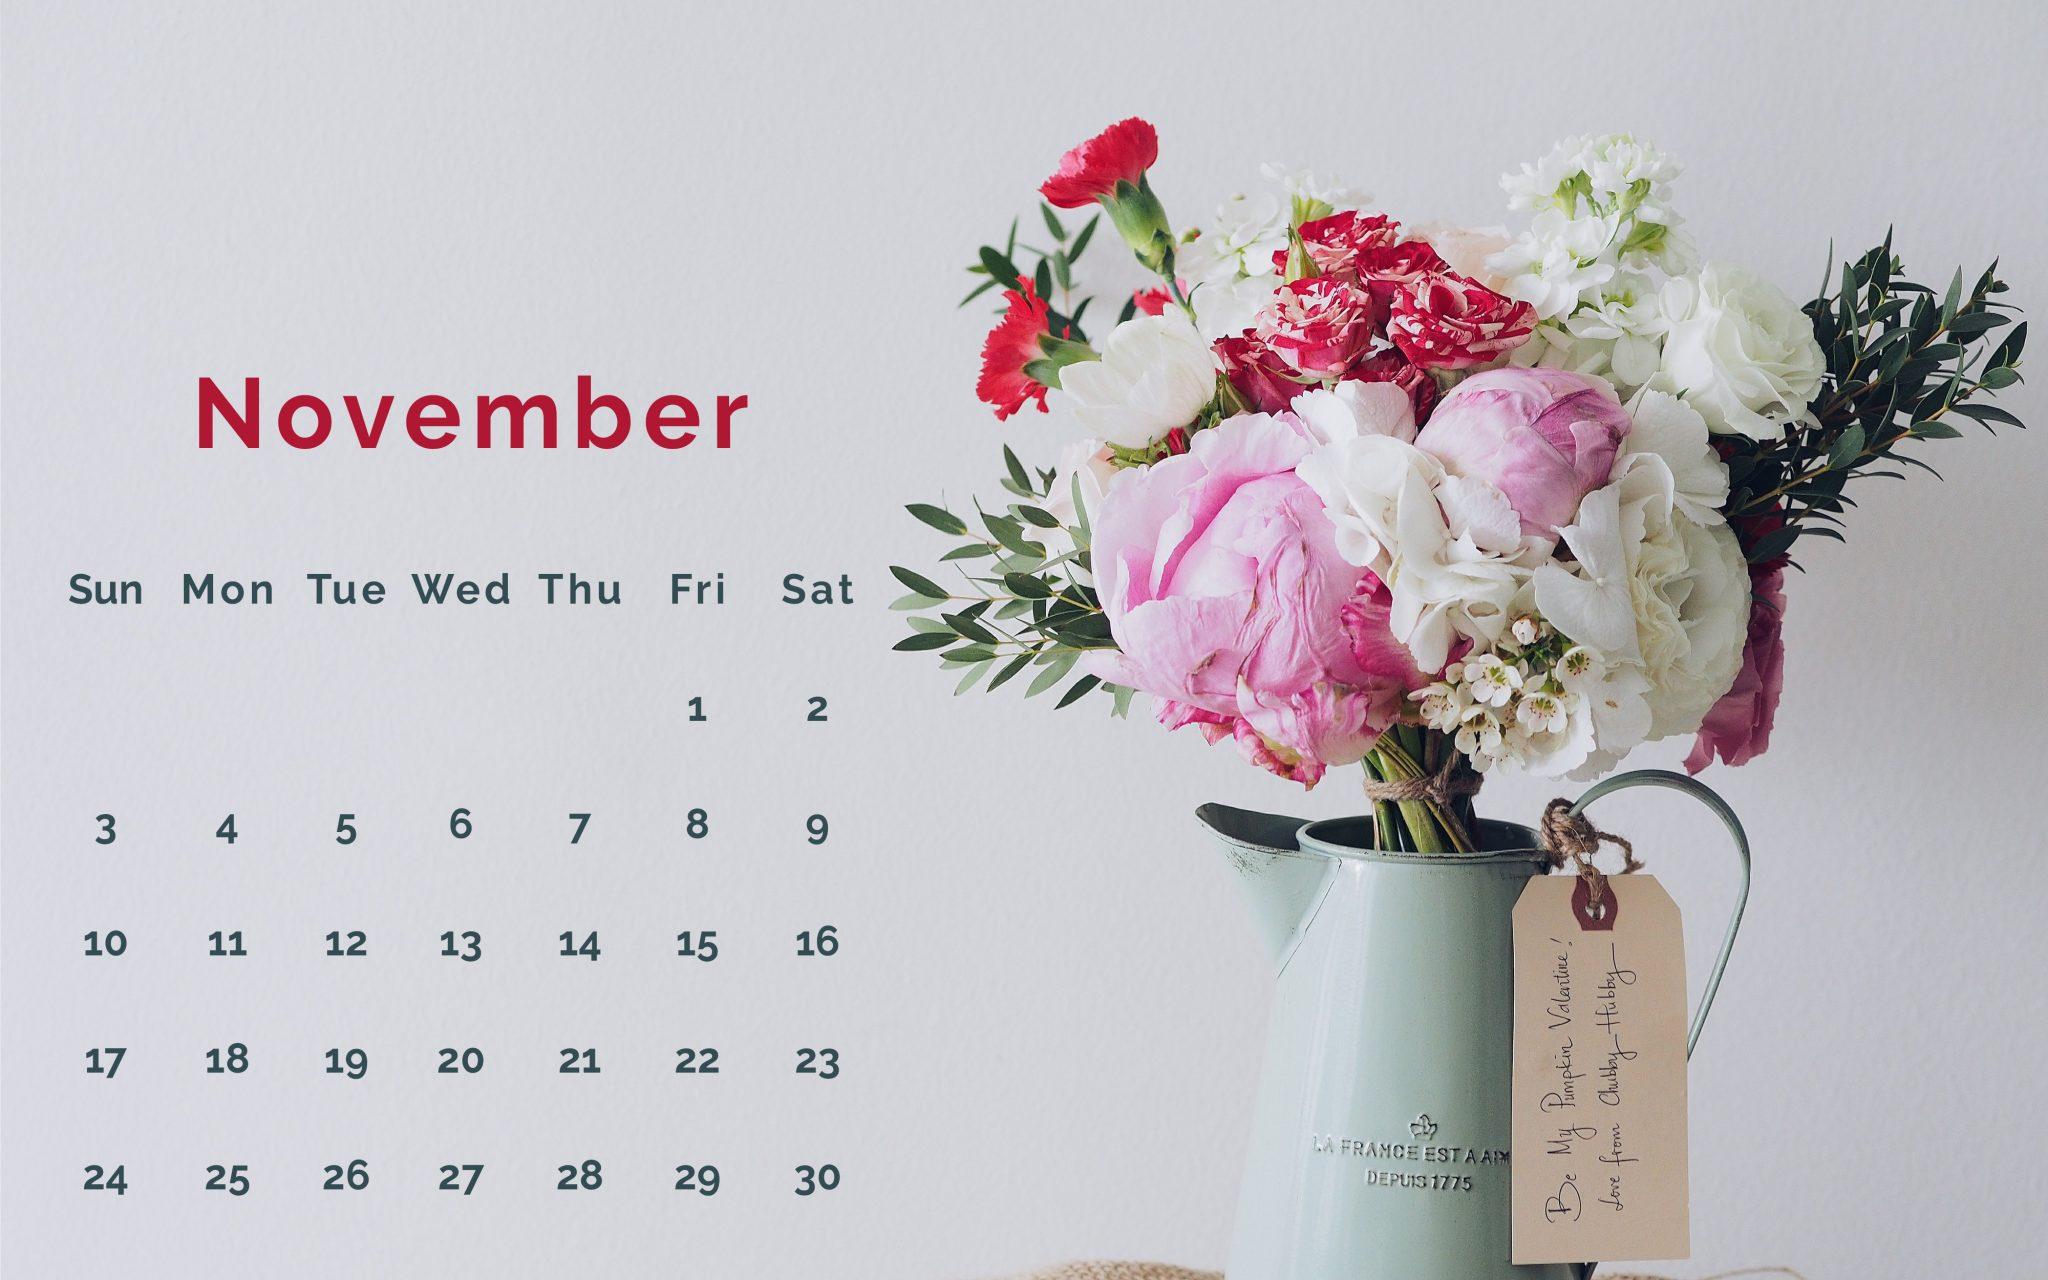 November 2019 PC Background Calendar Wallpaper